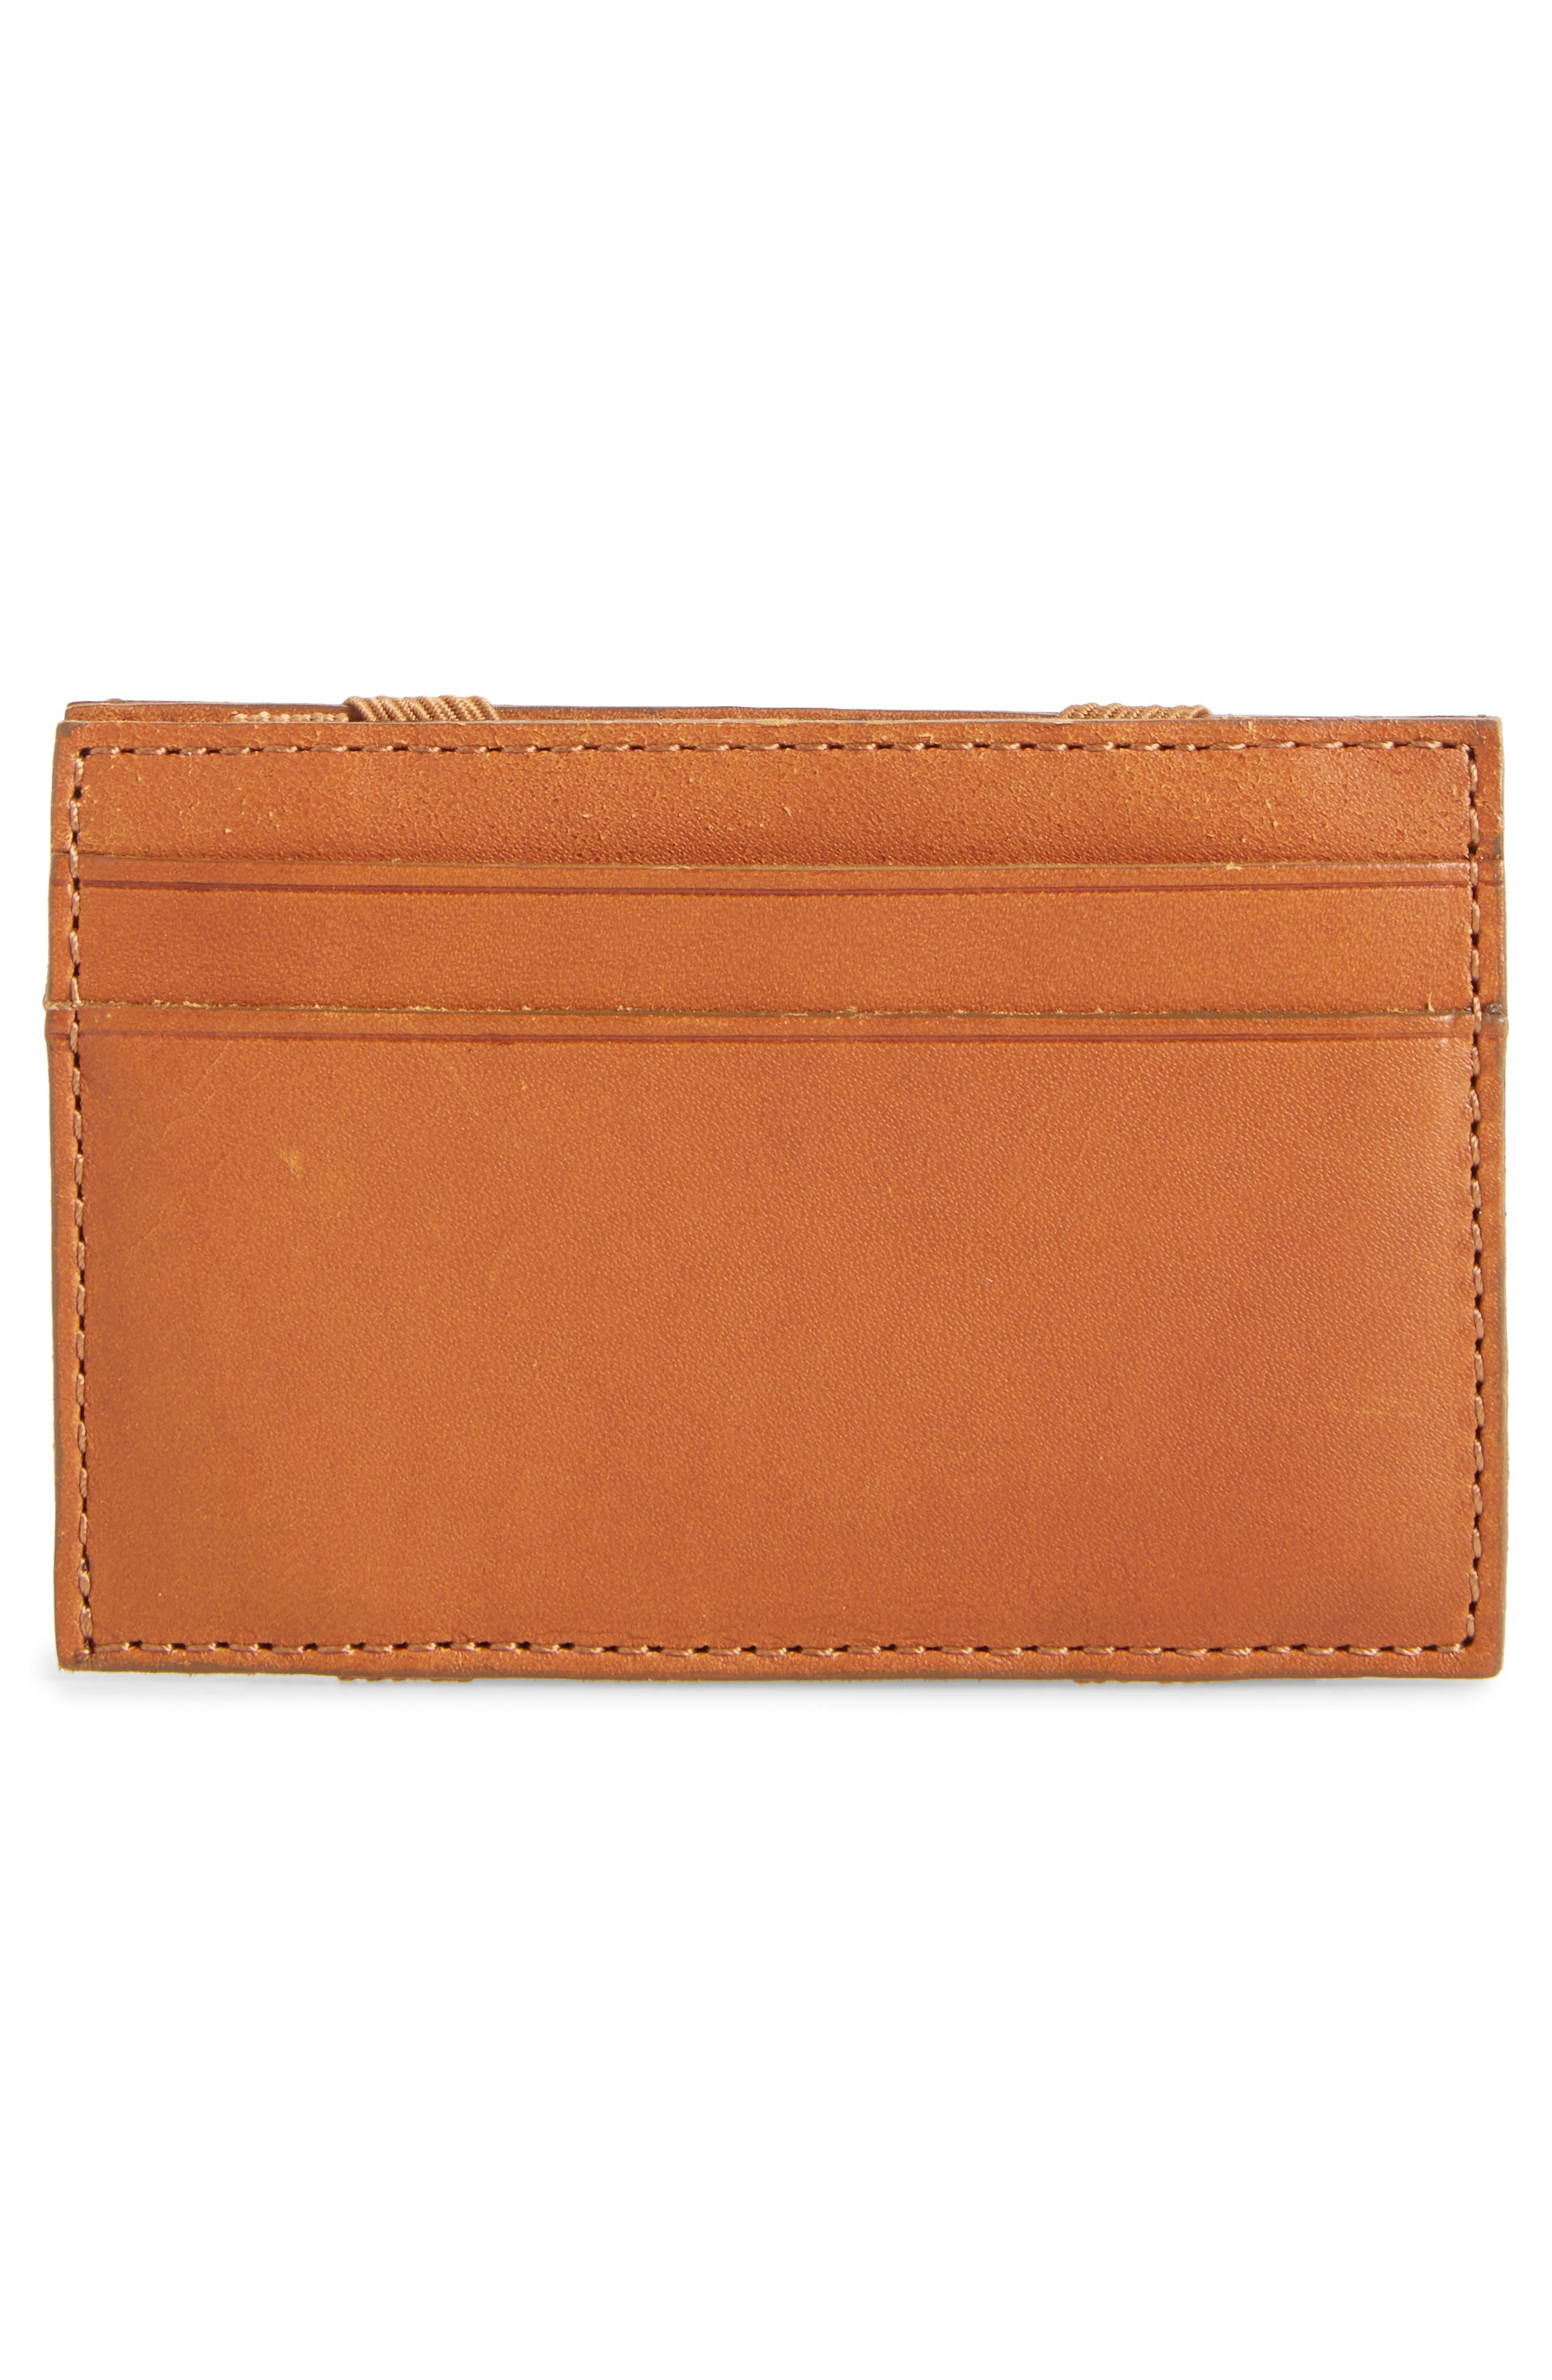 J.CREW,                             Magic Leather Wallet,                             Alternate thumbnail 3, color,                             200